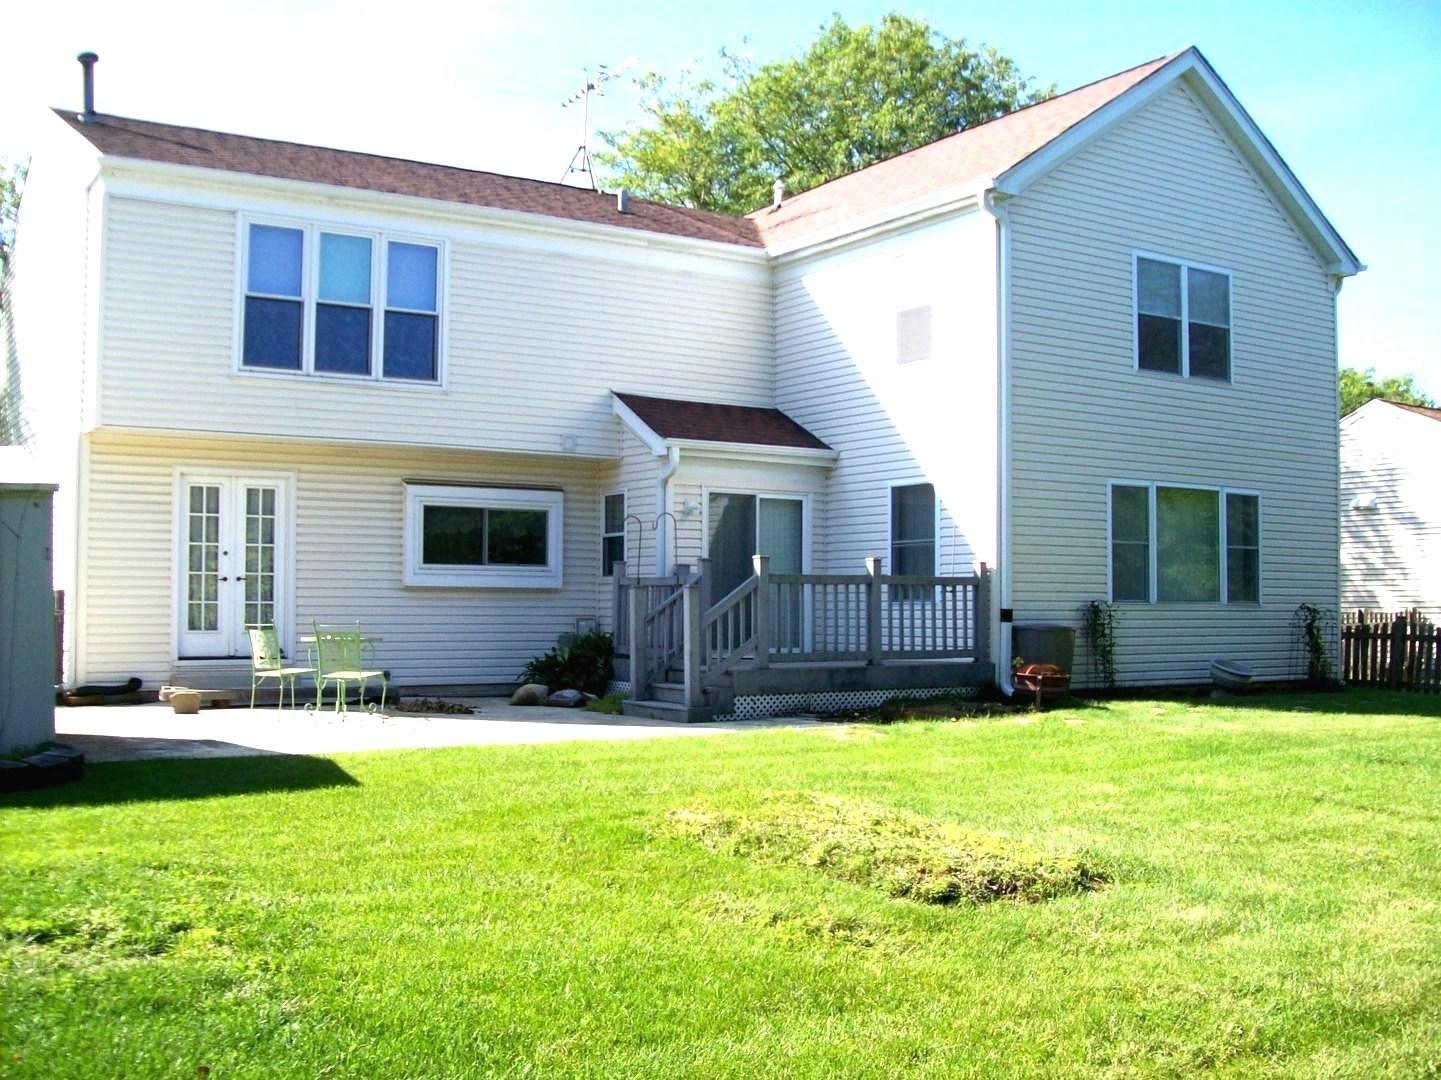 1102 Hyannis, Carol Stream, Illinois, 60188